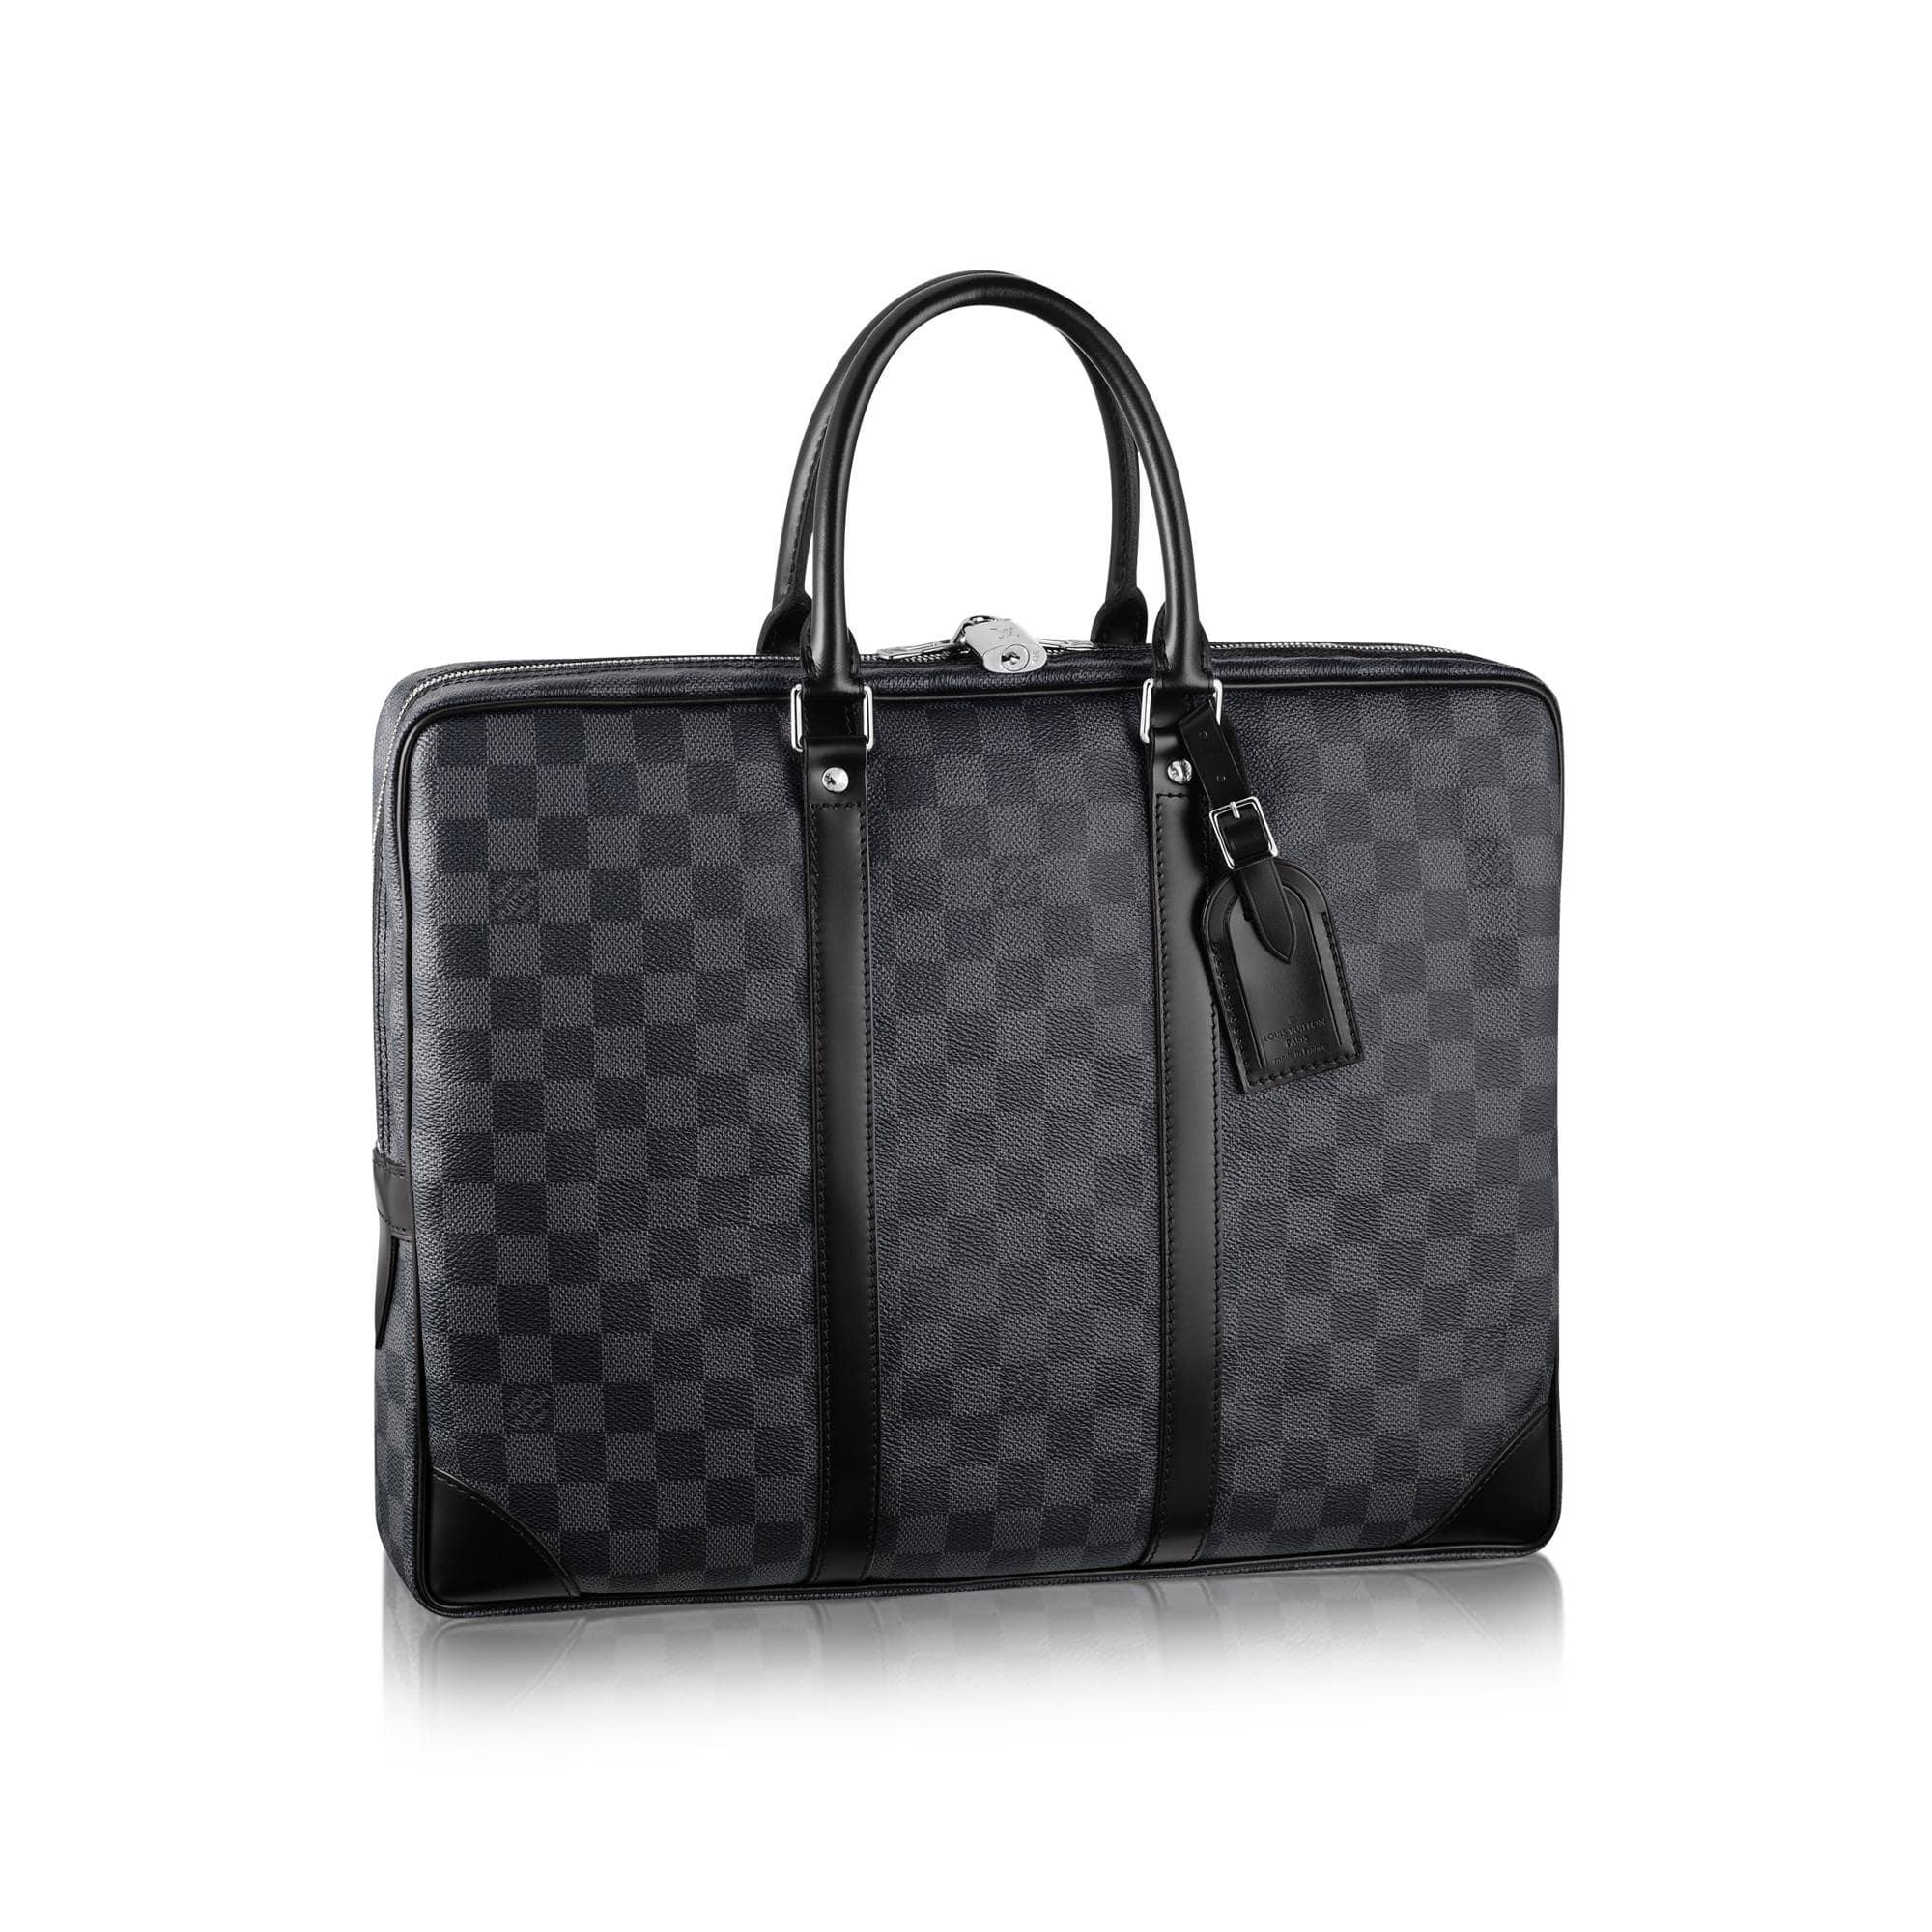 louis vuitton womens briefcase photo - 1